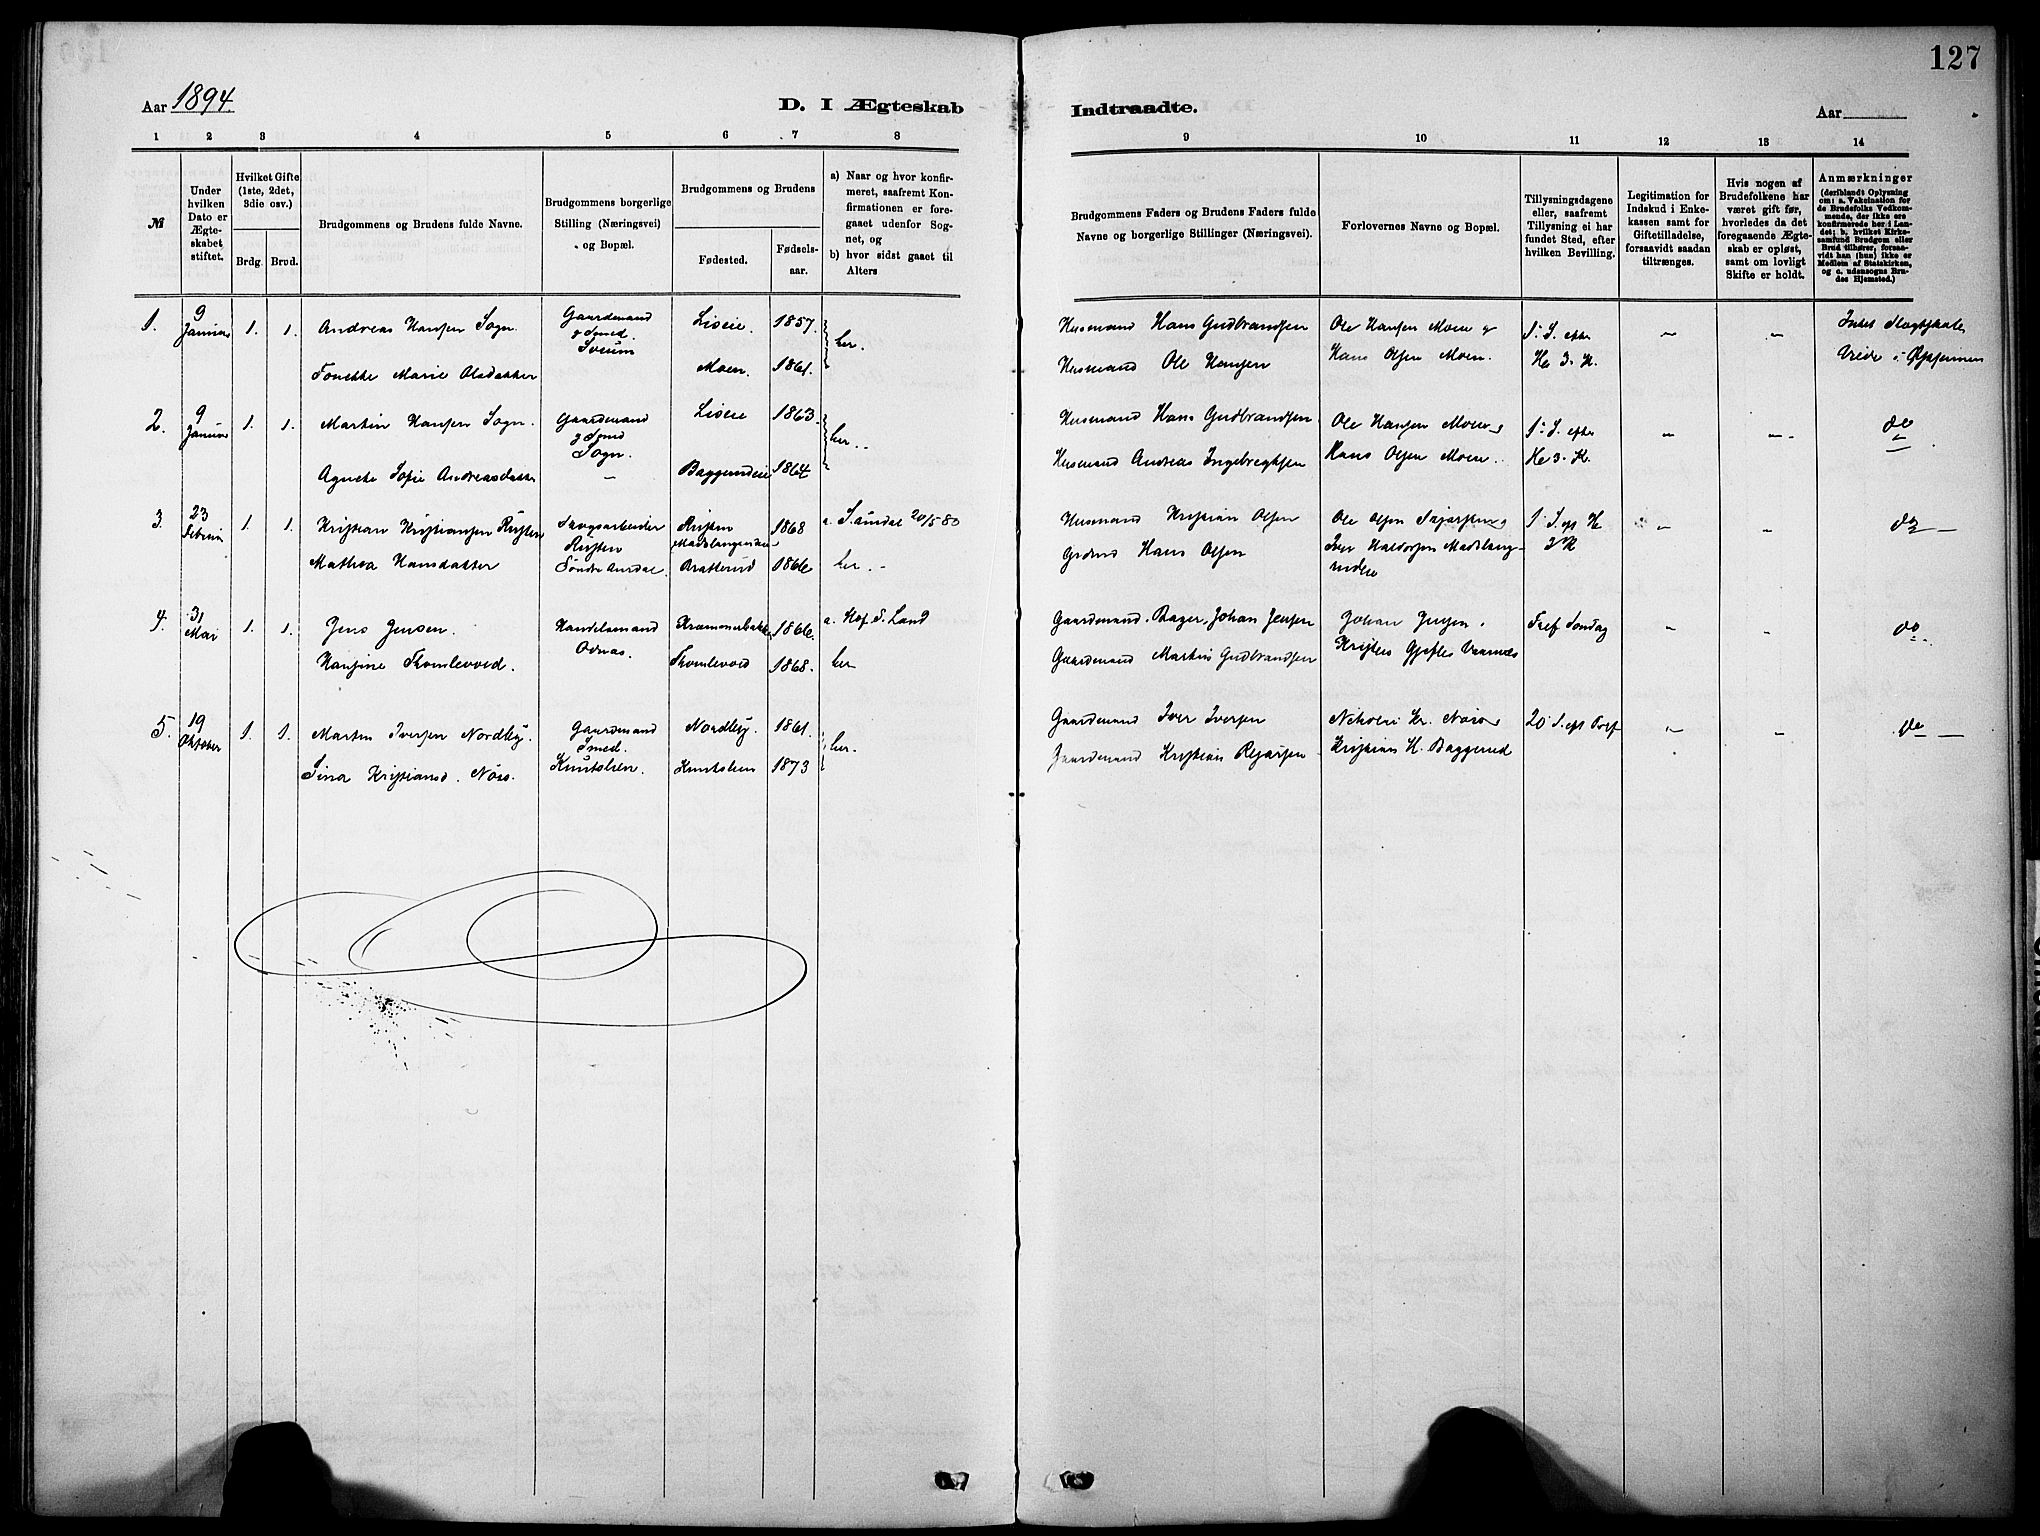 SAH, Nordre Land prestekontor, Ministerialbok nr. 5, 1882-1903, s. 127